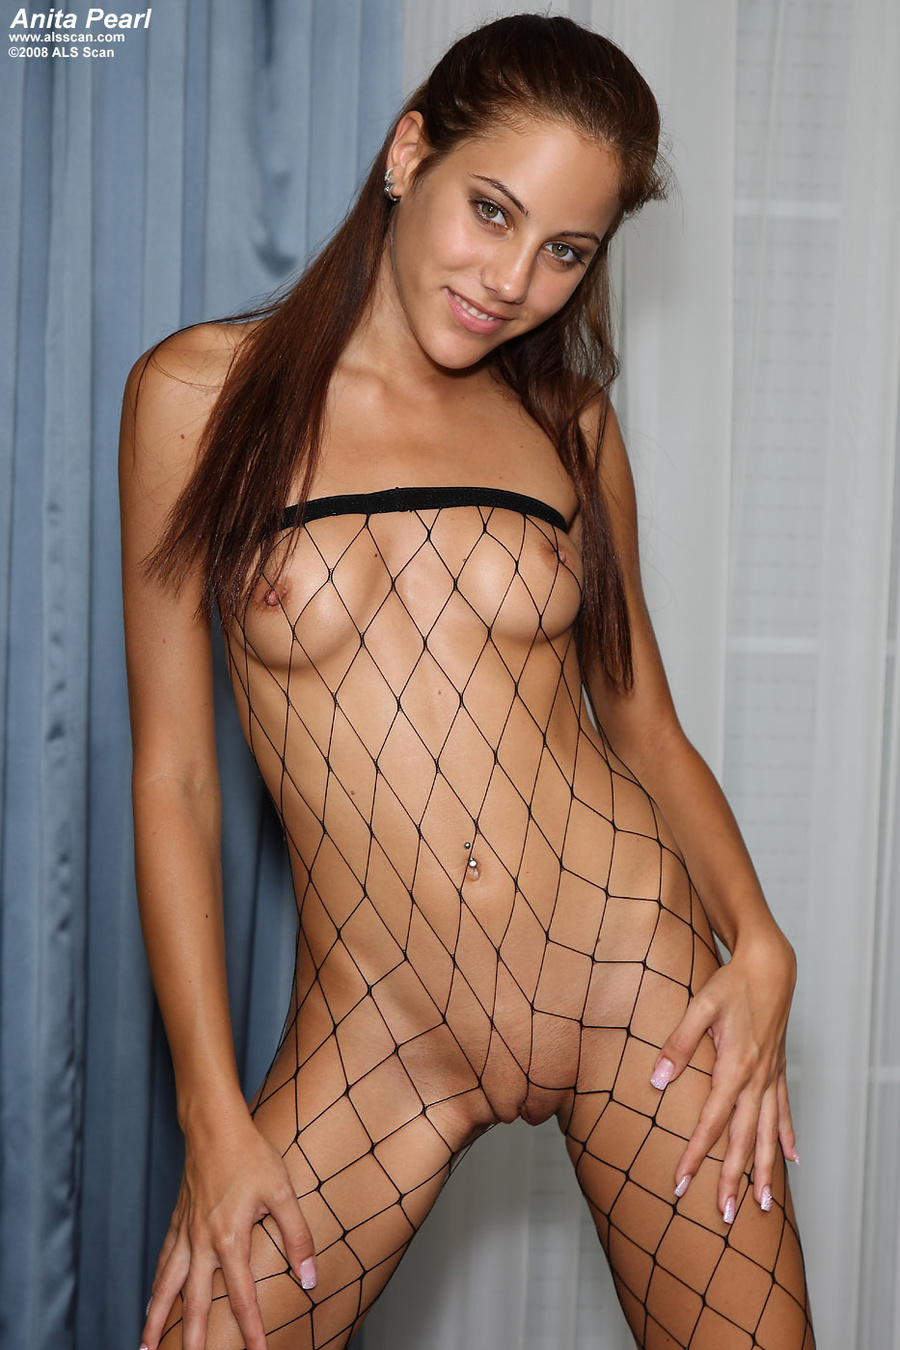 naked-mopar-anita-pearl-sex-lory